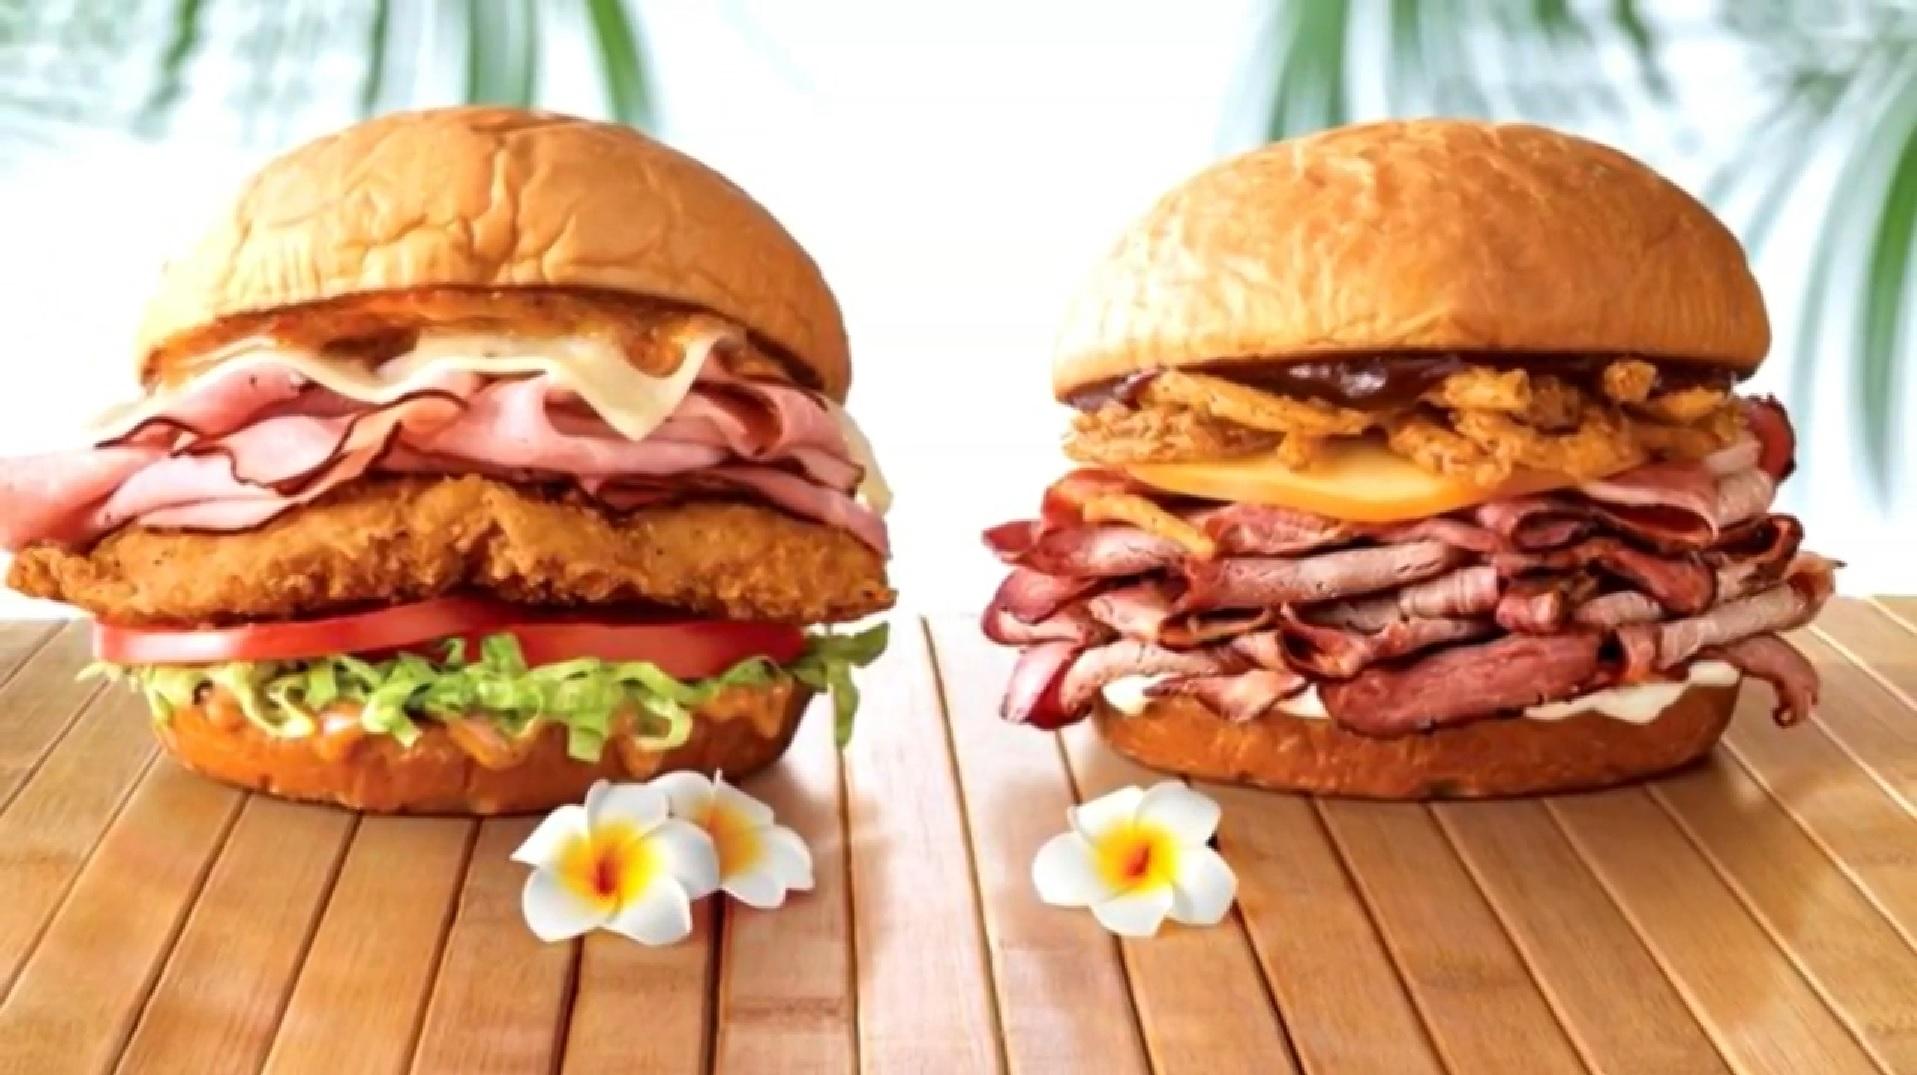 arbys hawaii sandwich_1555339148513.jpg.jpg